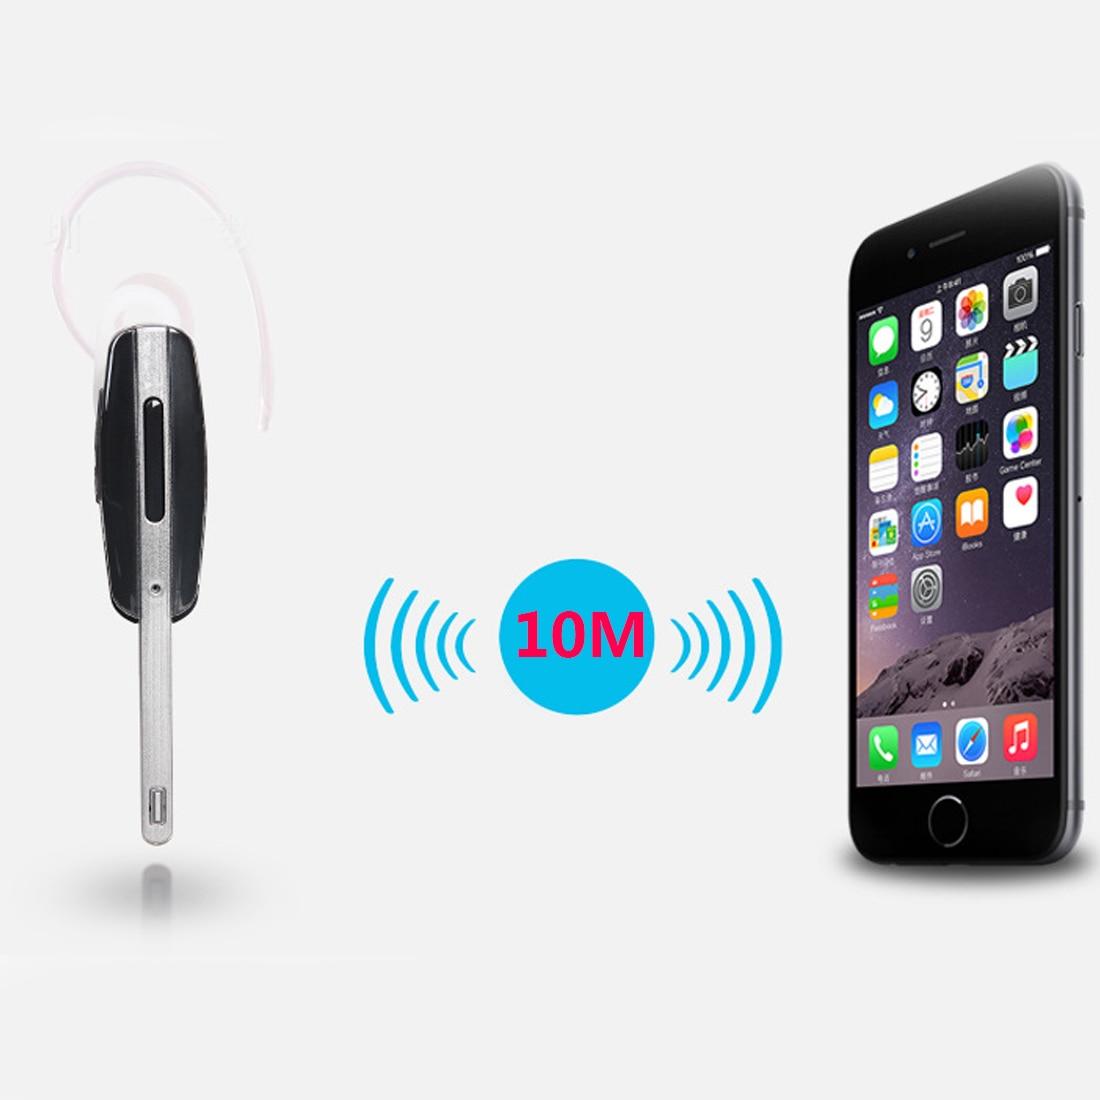 Marsnaska Wireless Handsfree Headphones Stereo Earphone Bluetooth Headset Single Channel Mic Earpiece For Samsung HM7000 wireless bluetooth stereo headset mic business car driver handsfree smart earphone for samsung for lg mini headphones portable